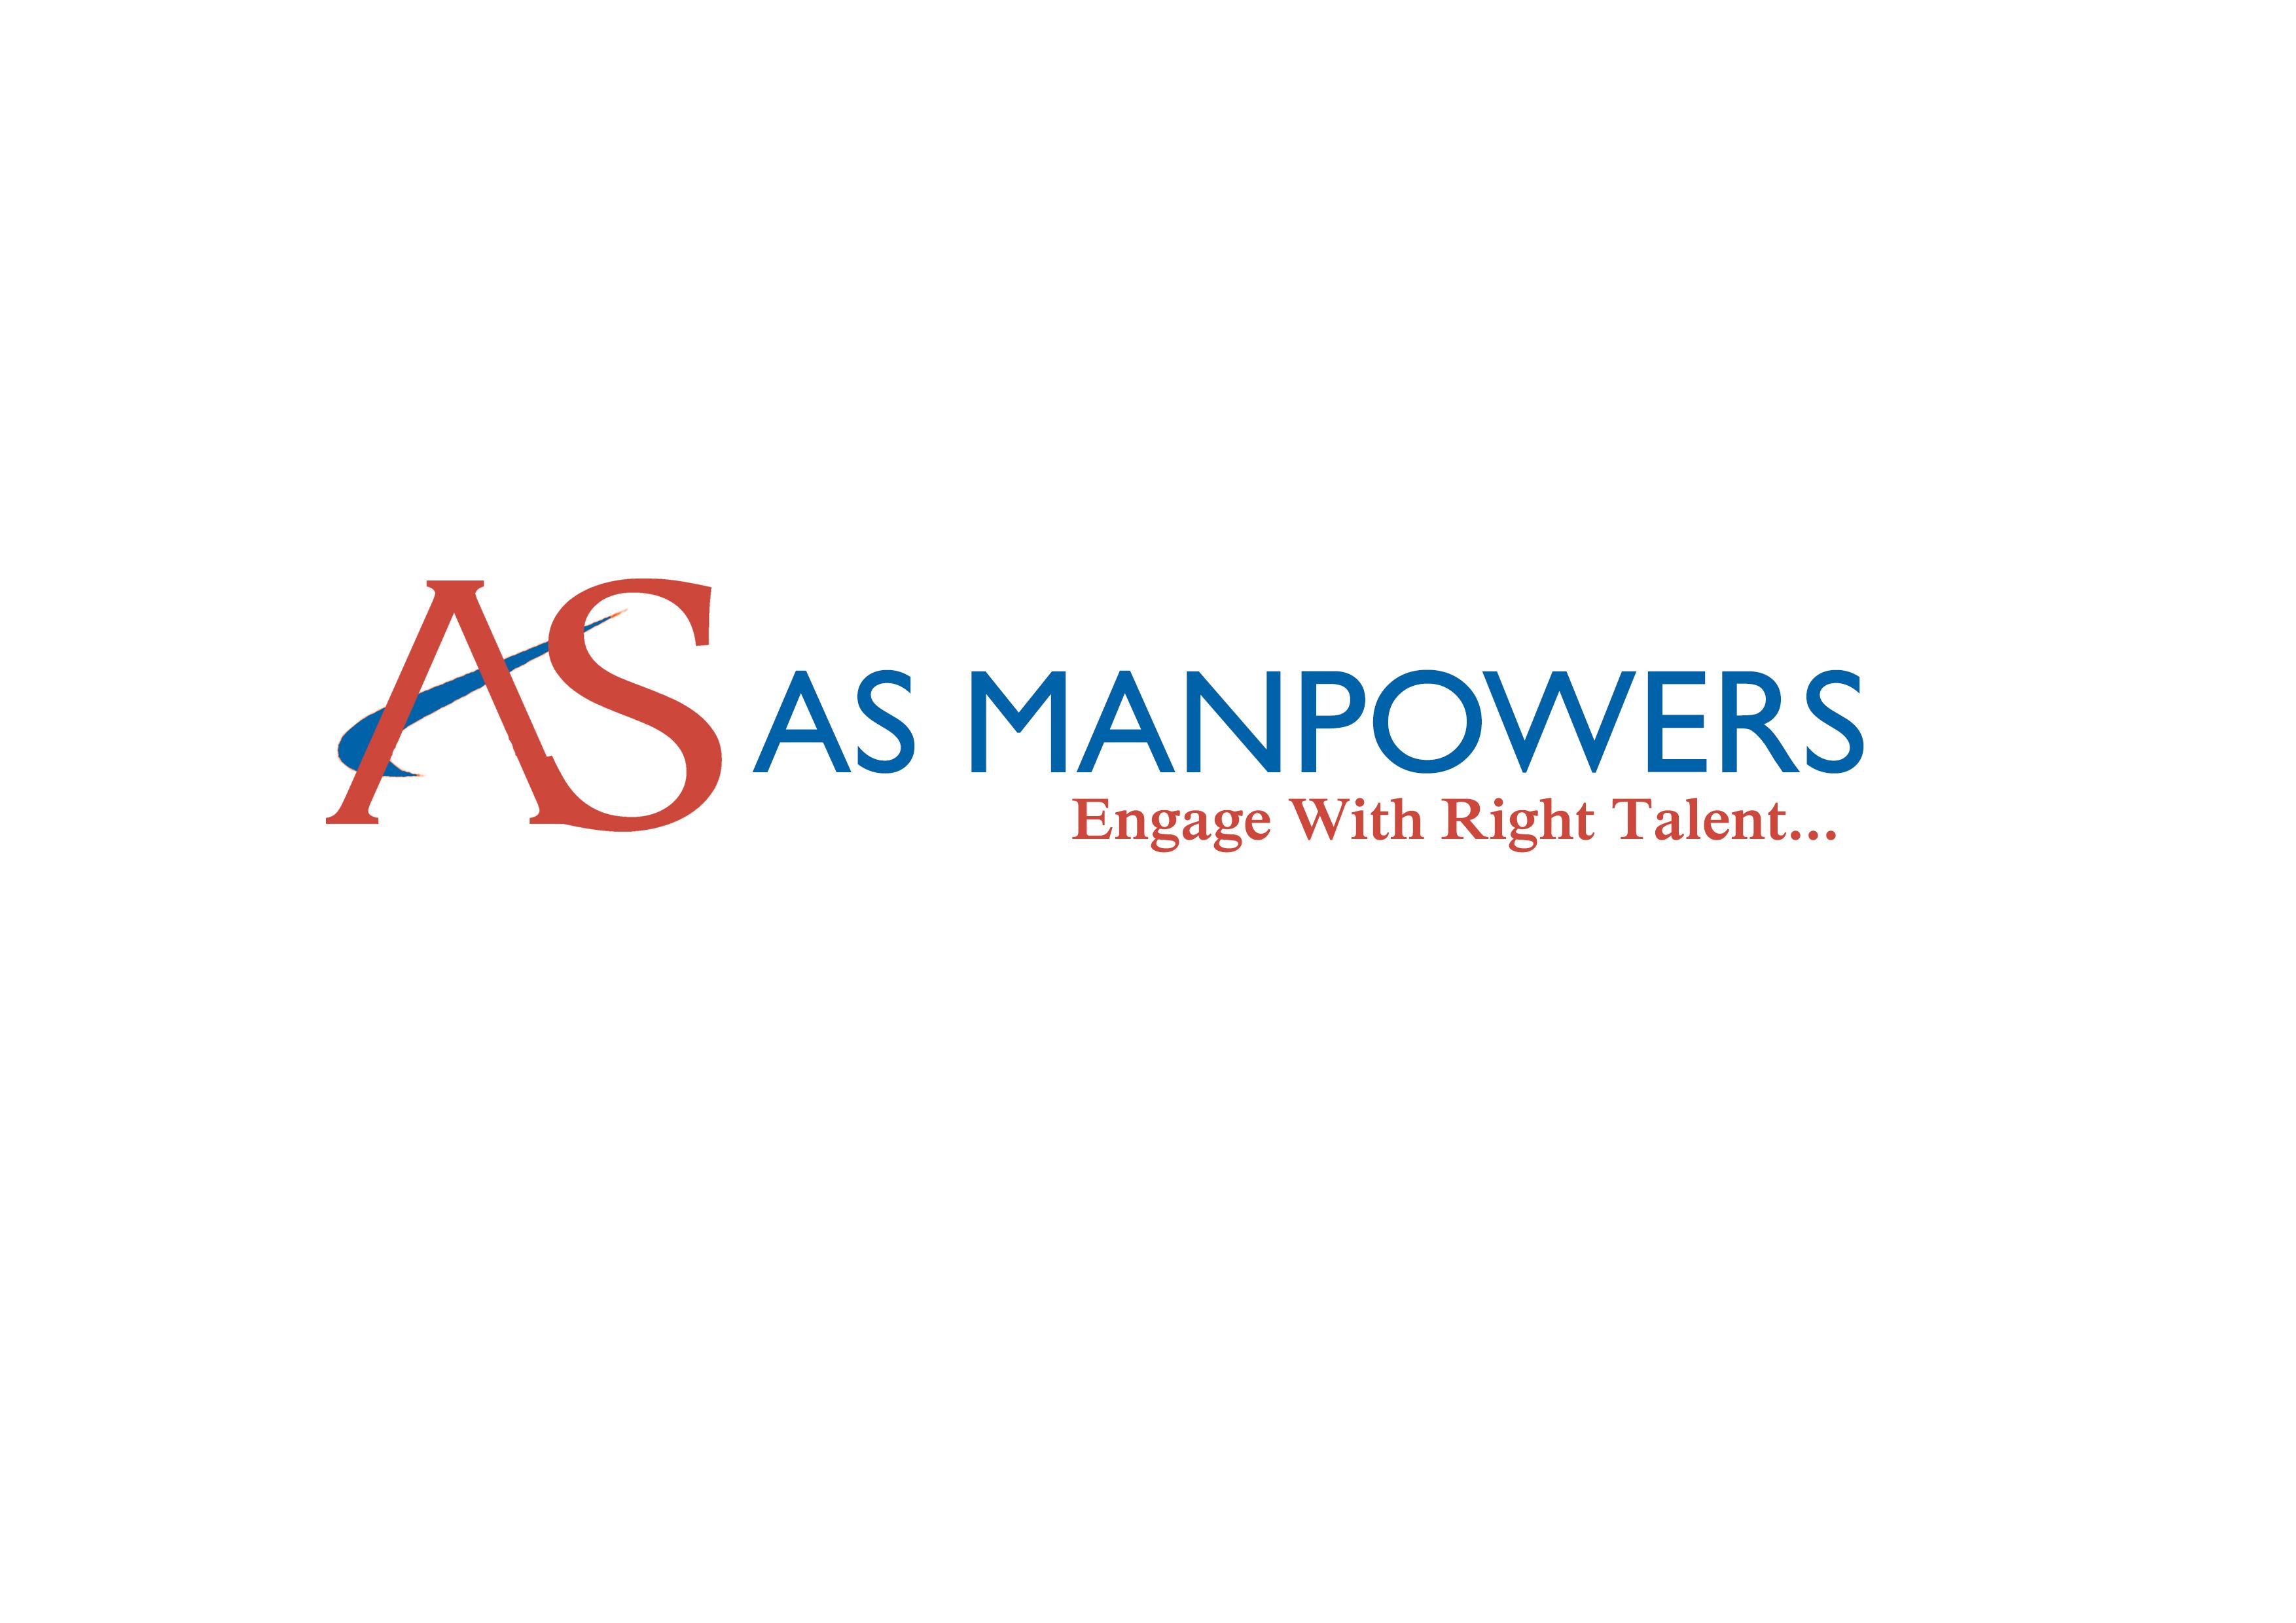 AS MANPOWERS